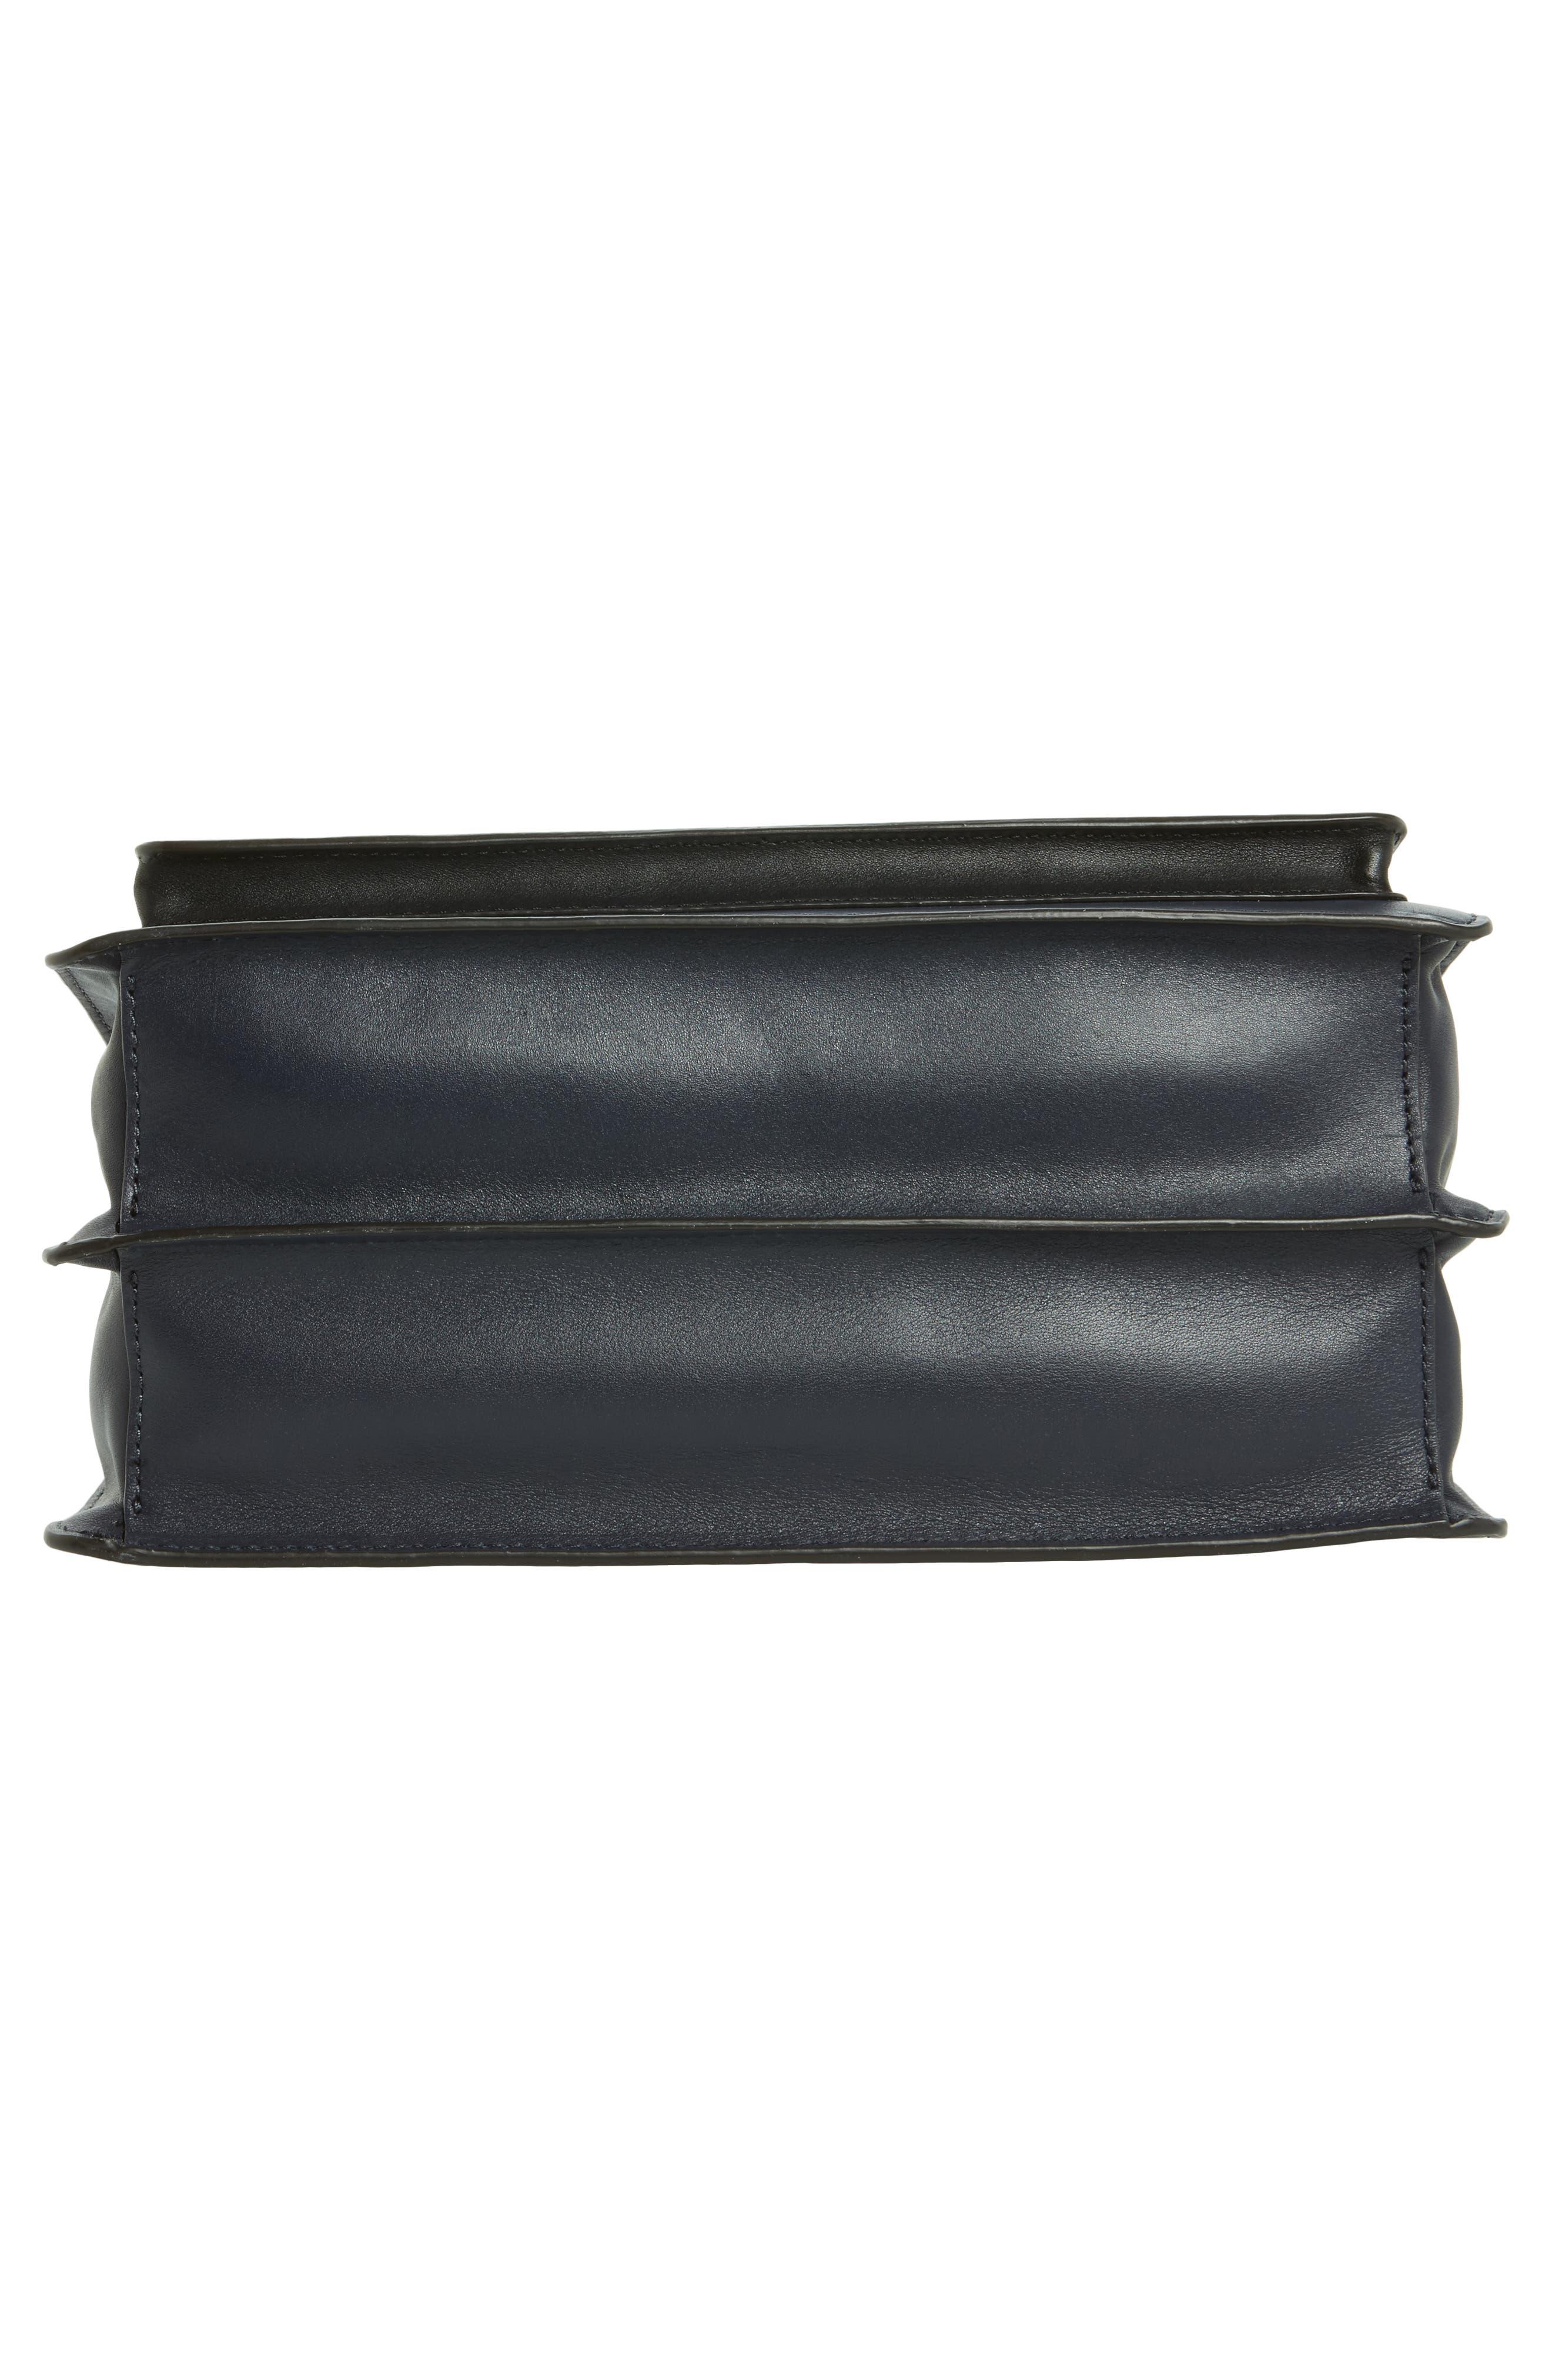 Top Handle Shoulder Bag,                             Alternate thumbnail 6, color,                             001